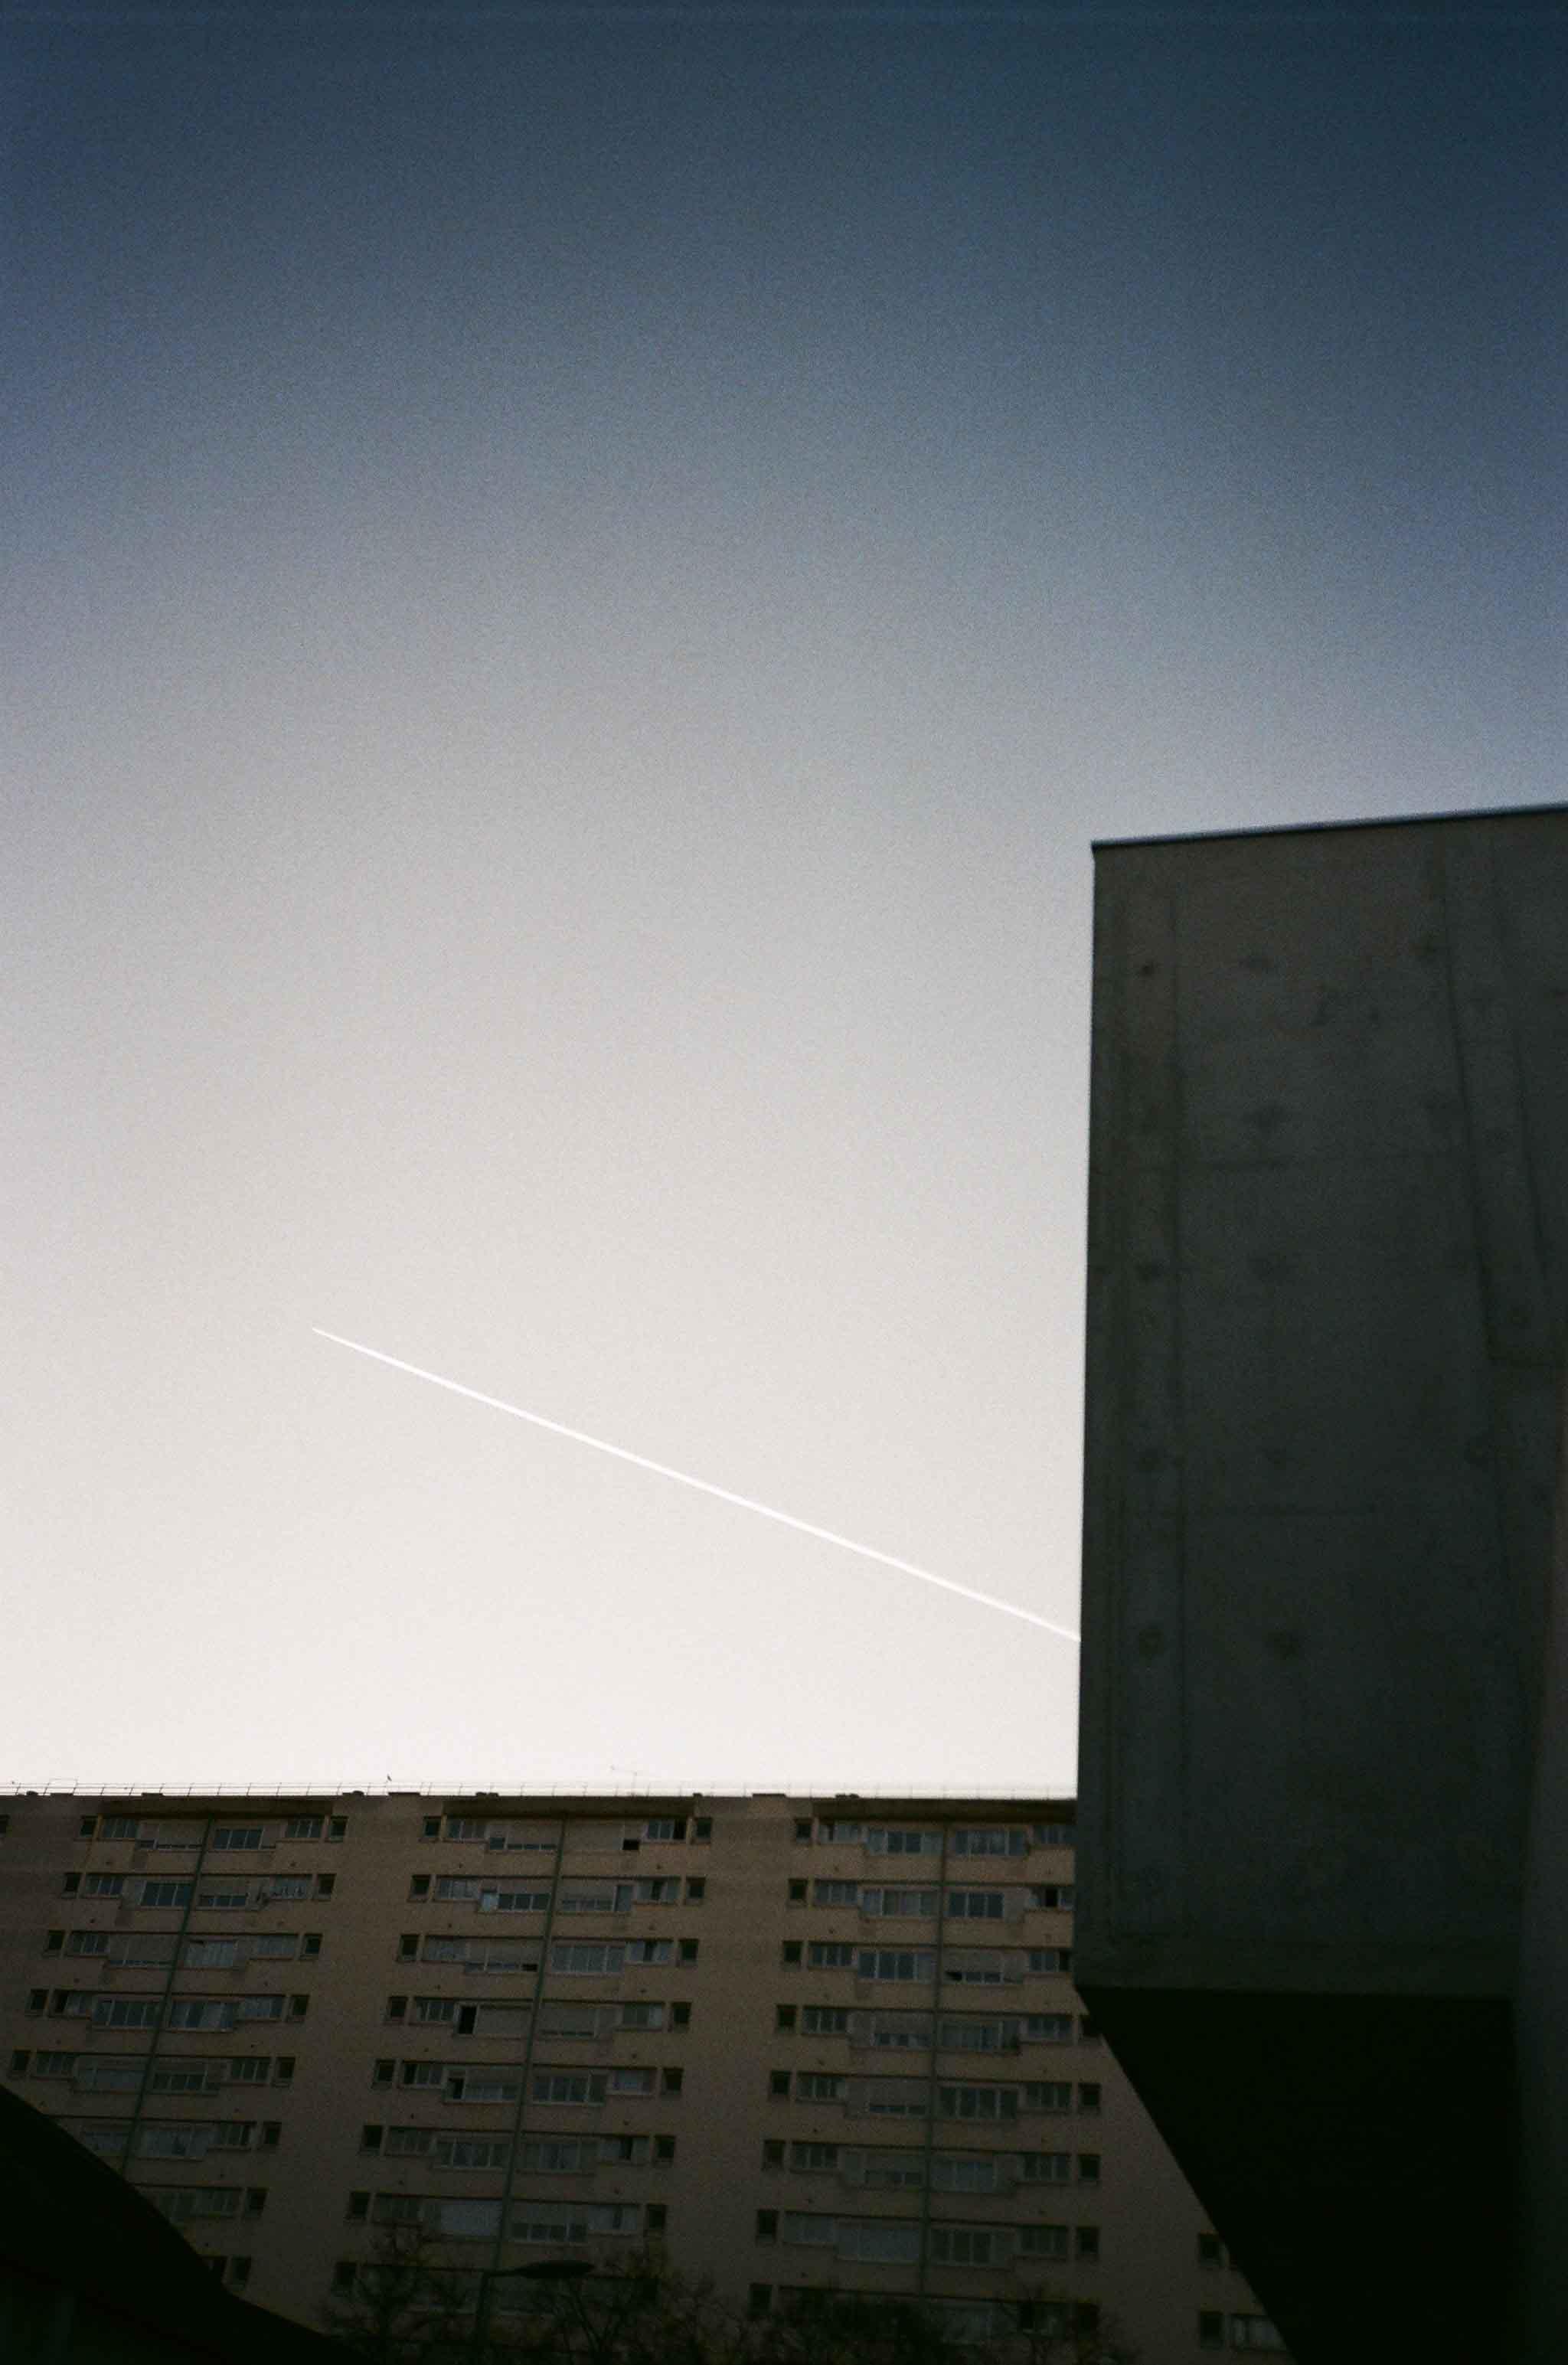 ChristosVourlis_photography_CVHAIR_CVDIARY_personal diary__film_35mm_34190035_.JPG